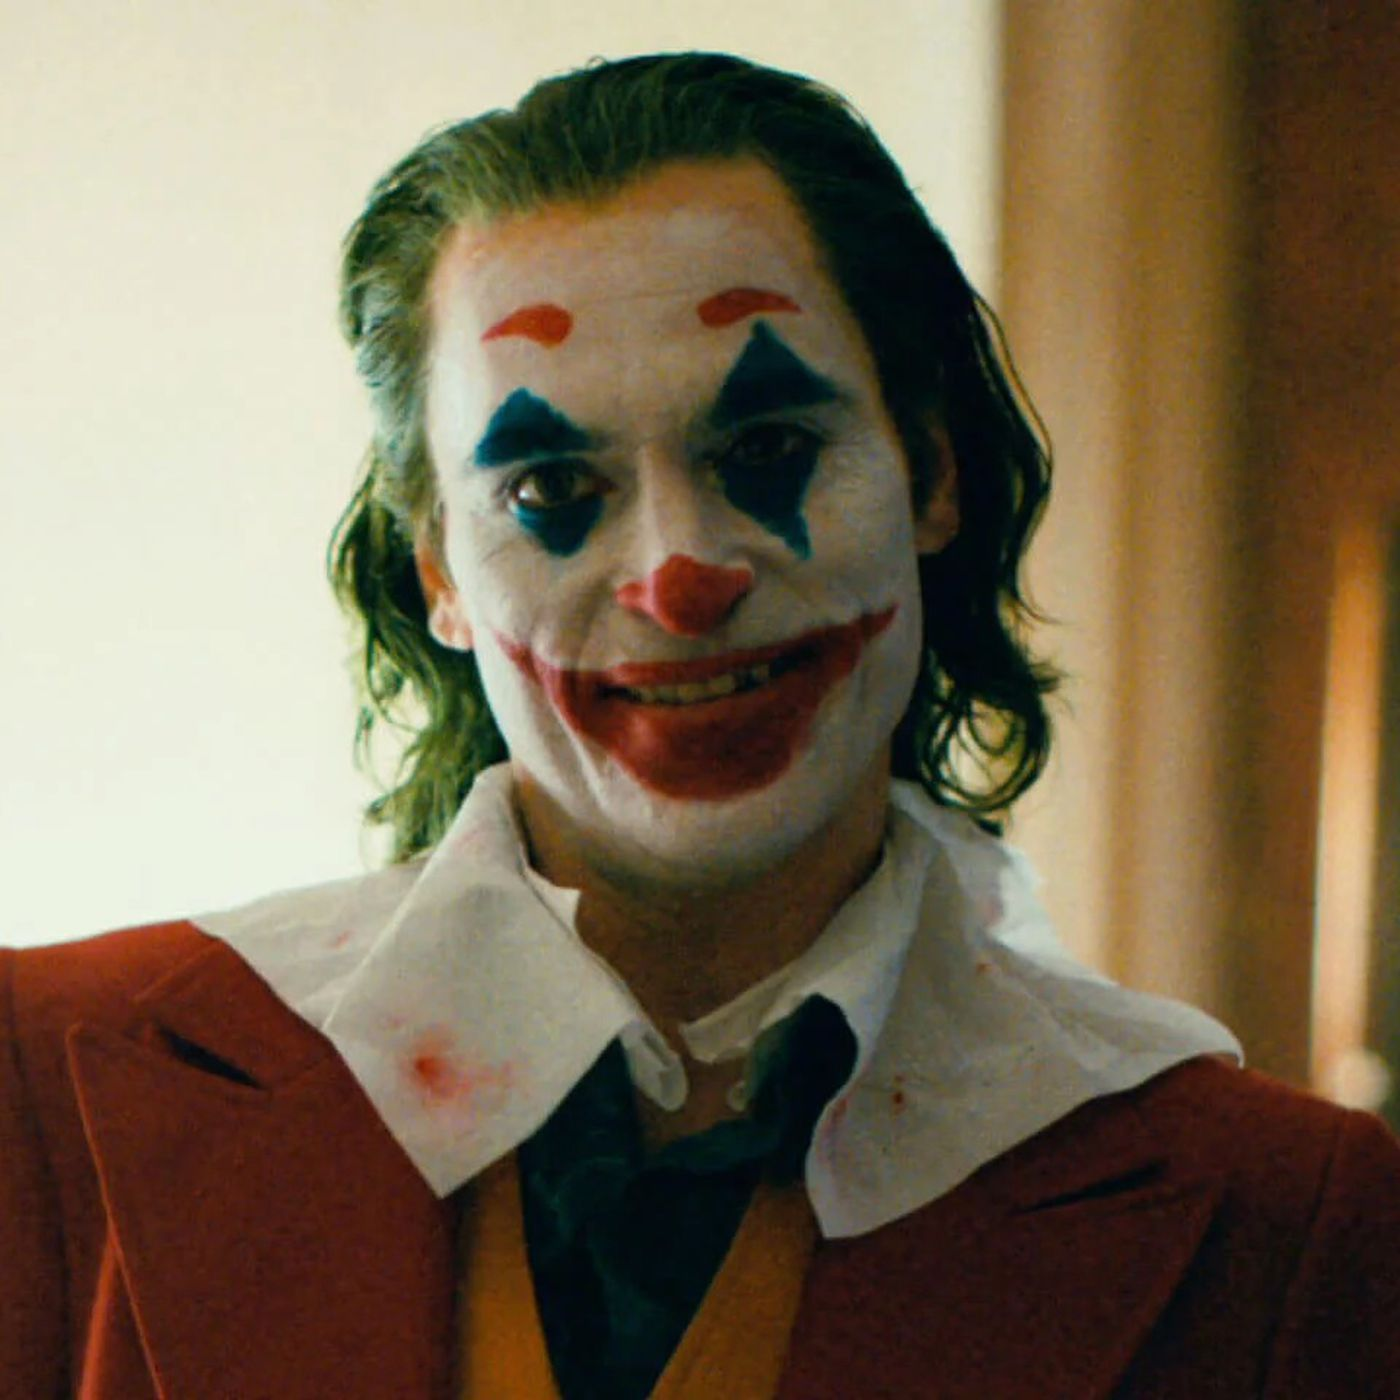 joker2 The 20 Biggest Ways Joker Breaks the Superhero Mold